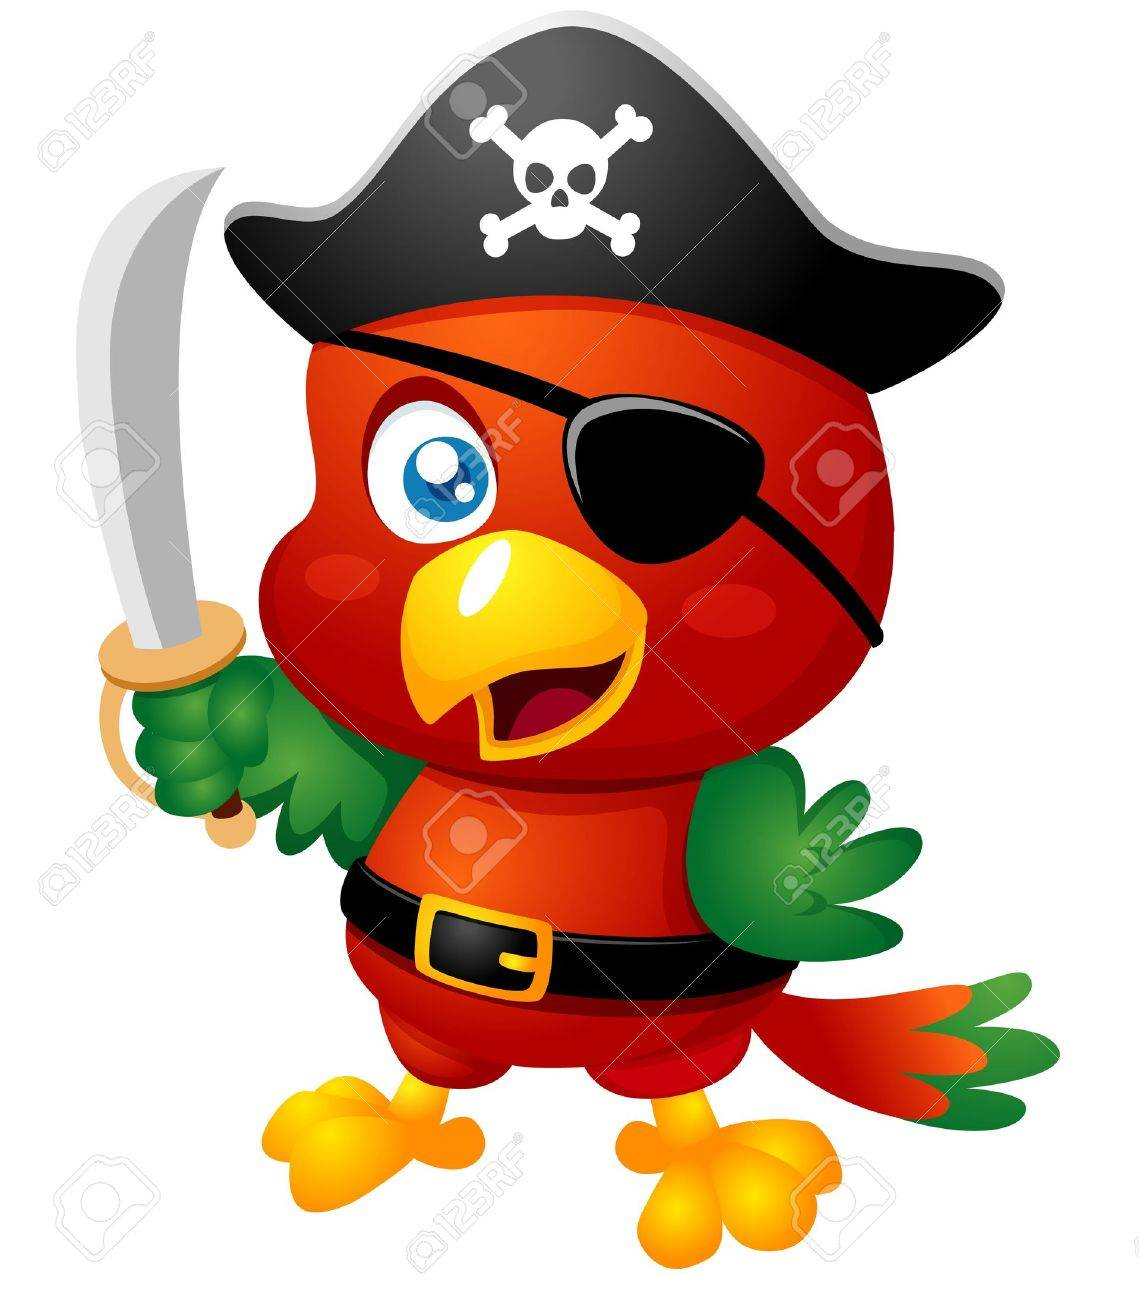 Illustration of Cartoon Pirate Parrot Stock Vector - 15904584